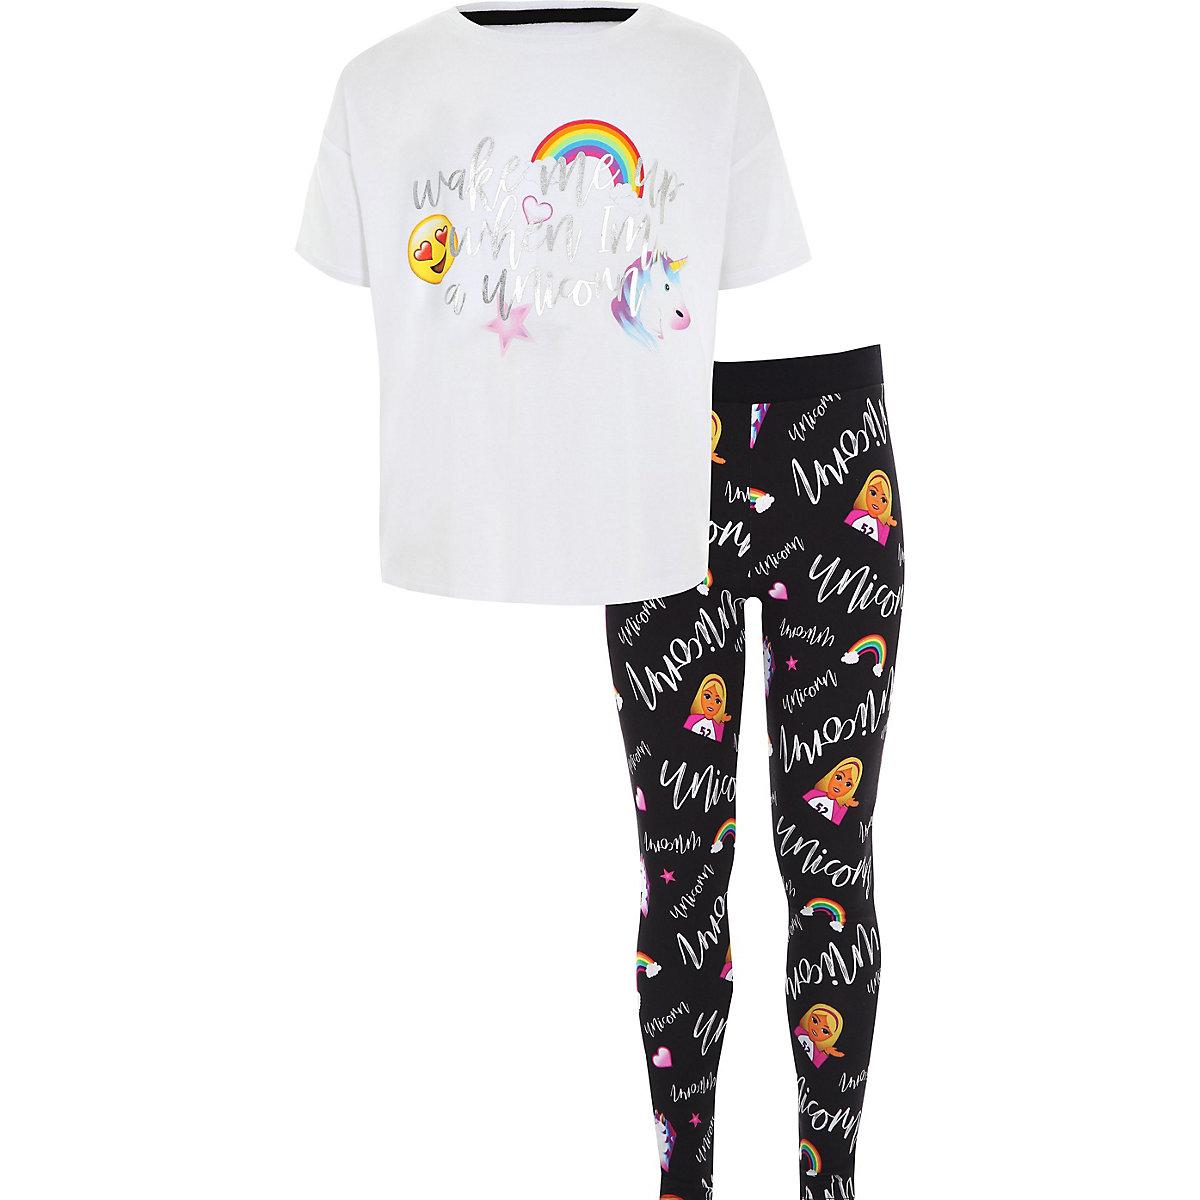 Girls white 'Wake me up' unicorn pajamas